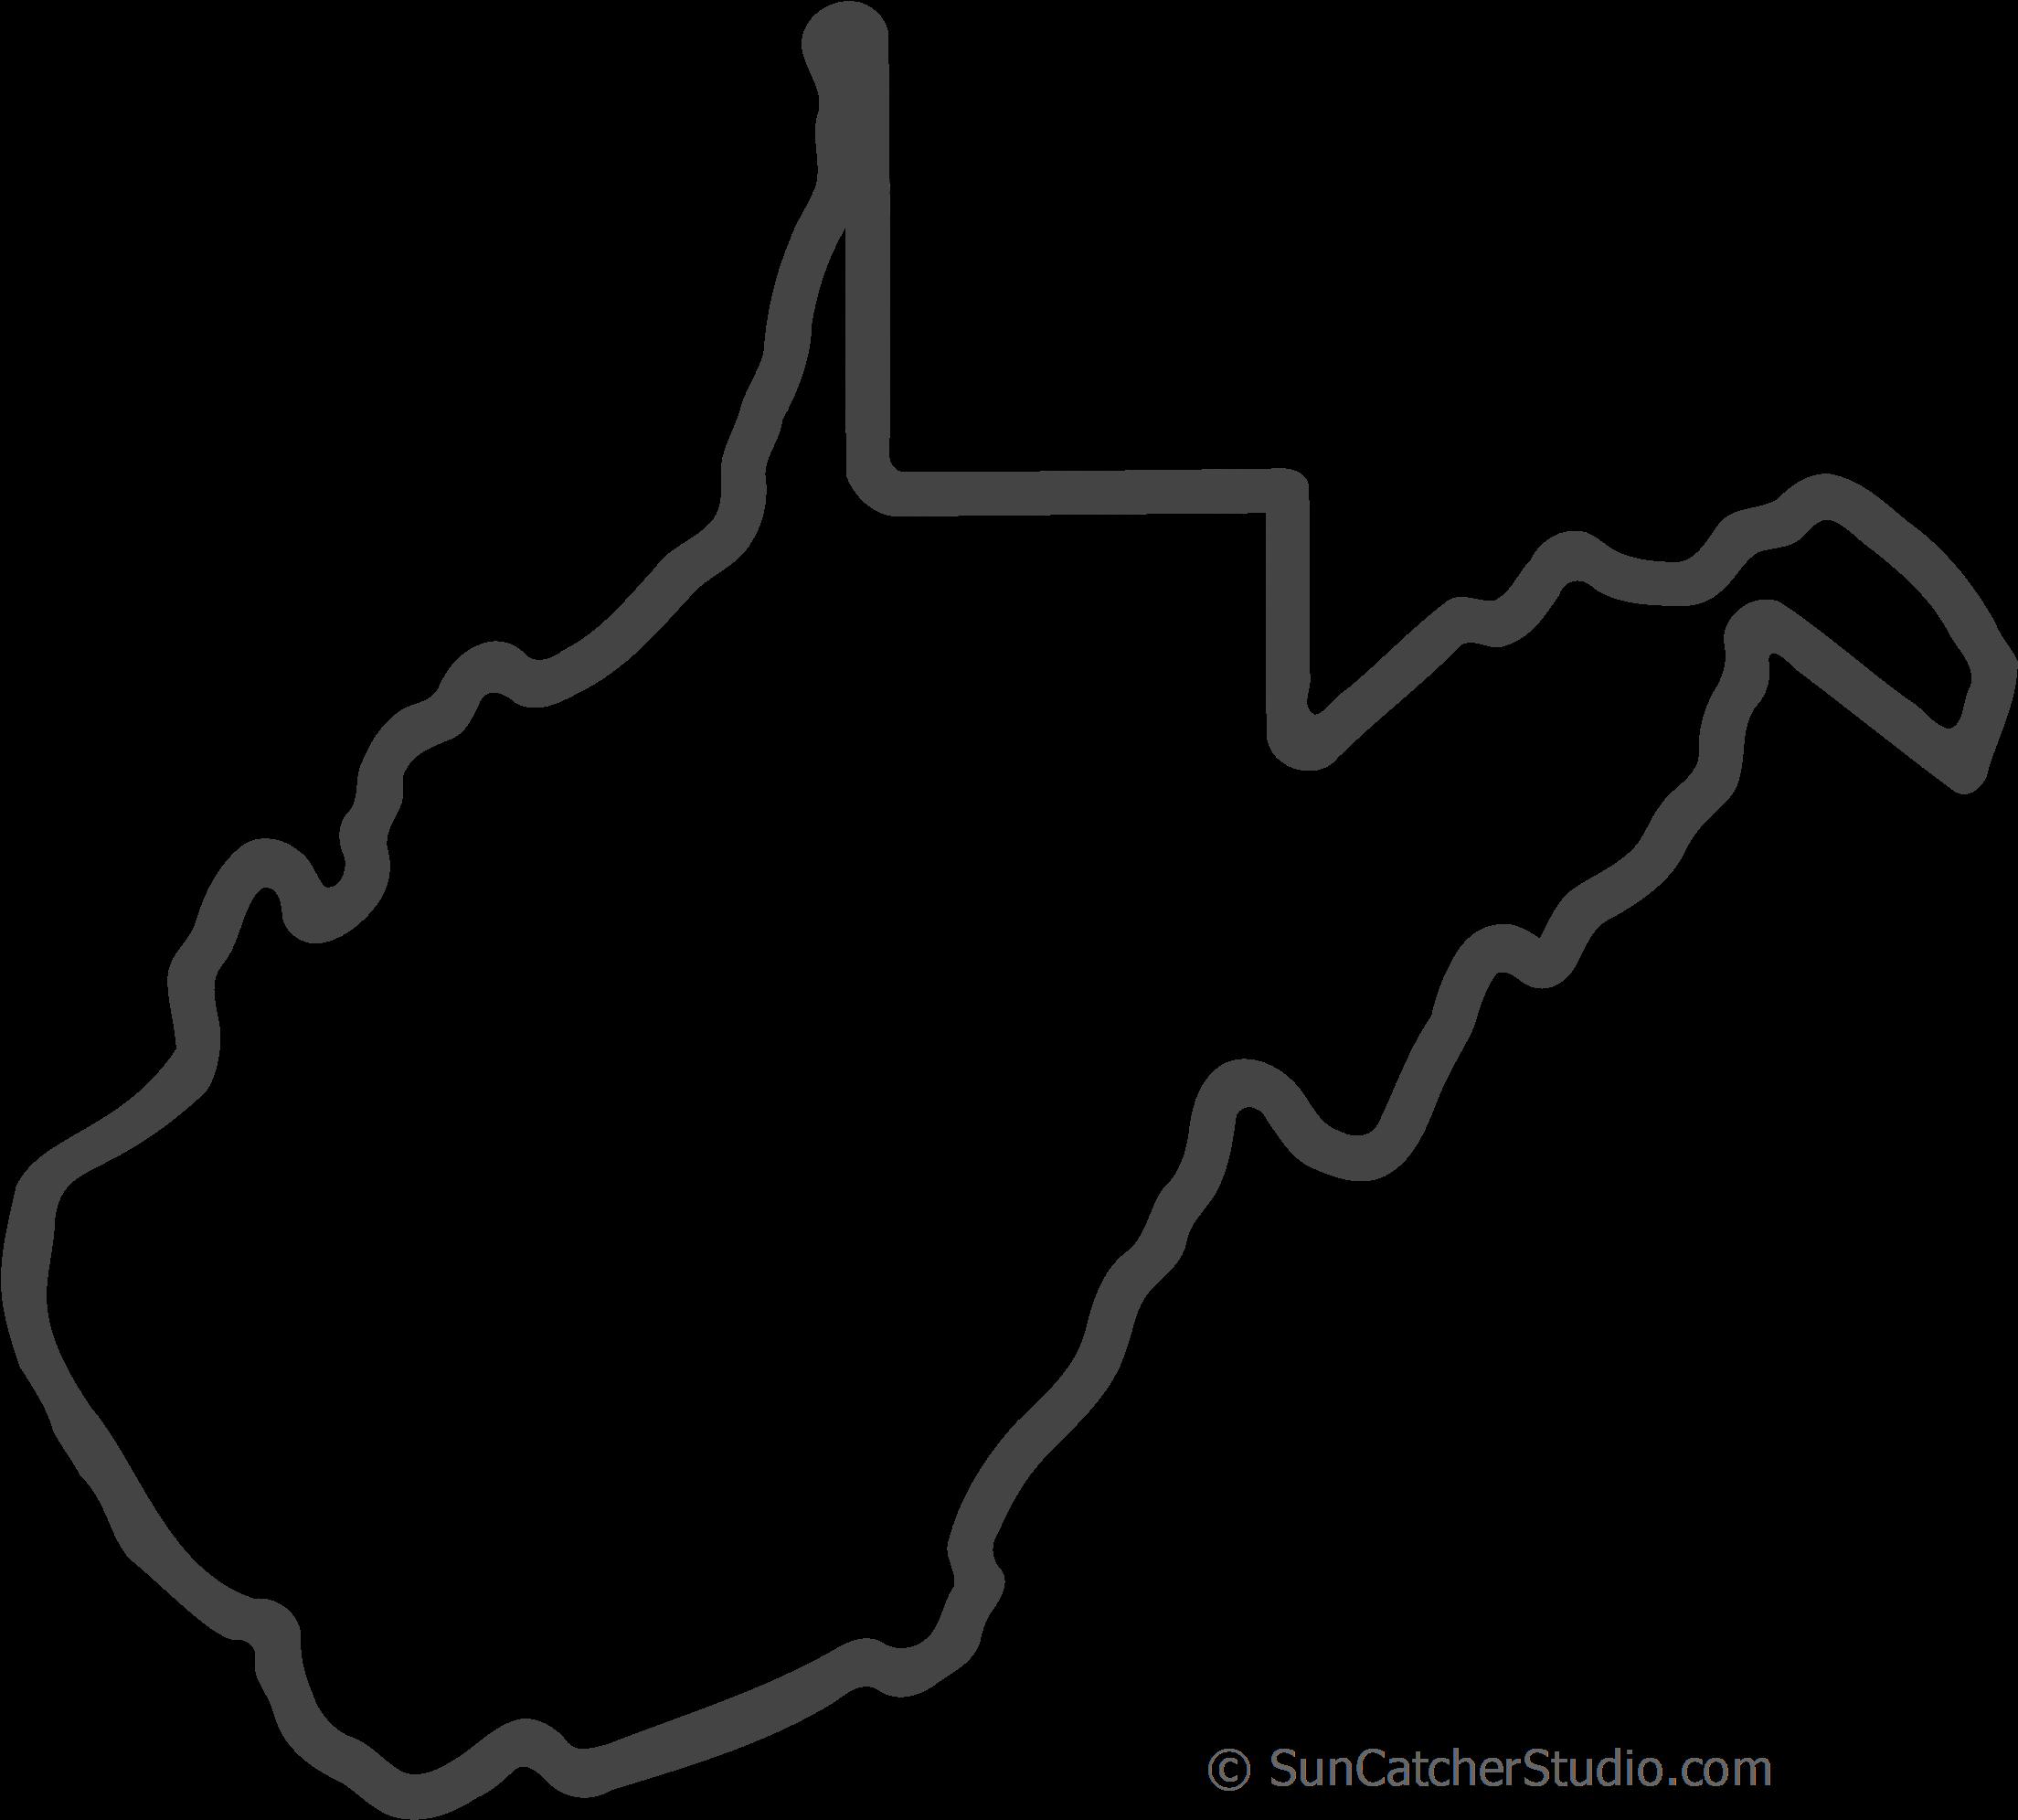 West virginia clipart black clip transparent Free West Virginia Outline With Home On Border, Cricut ... clip transparent